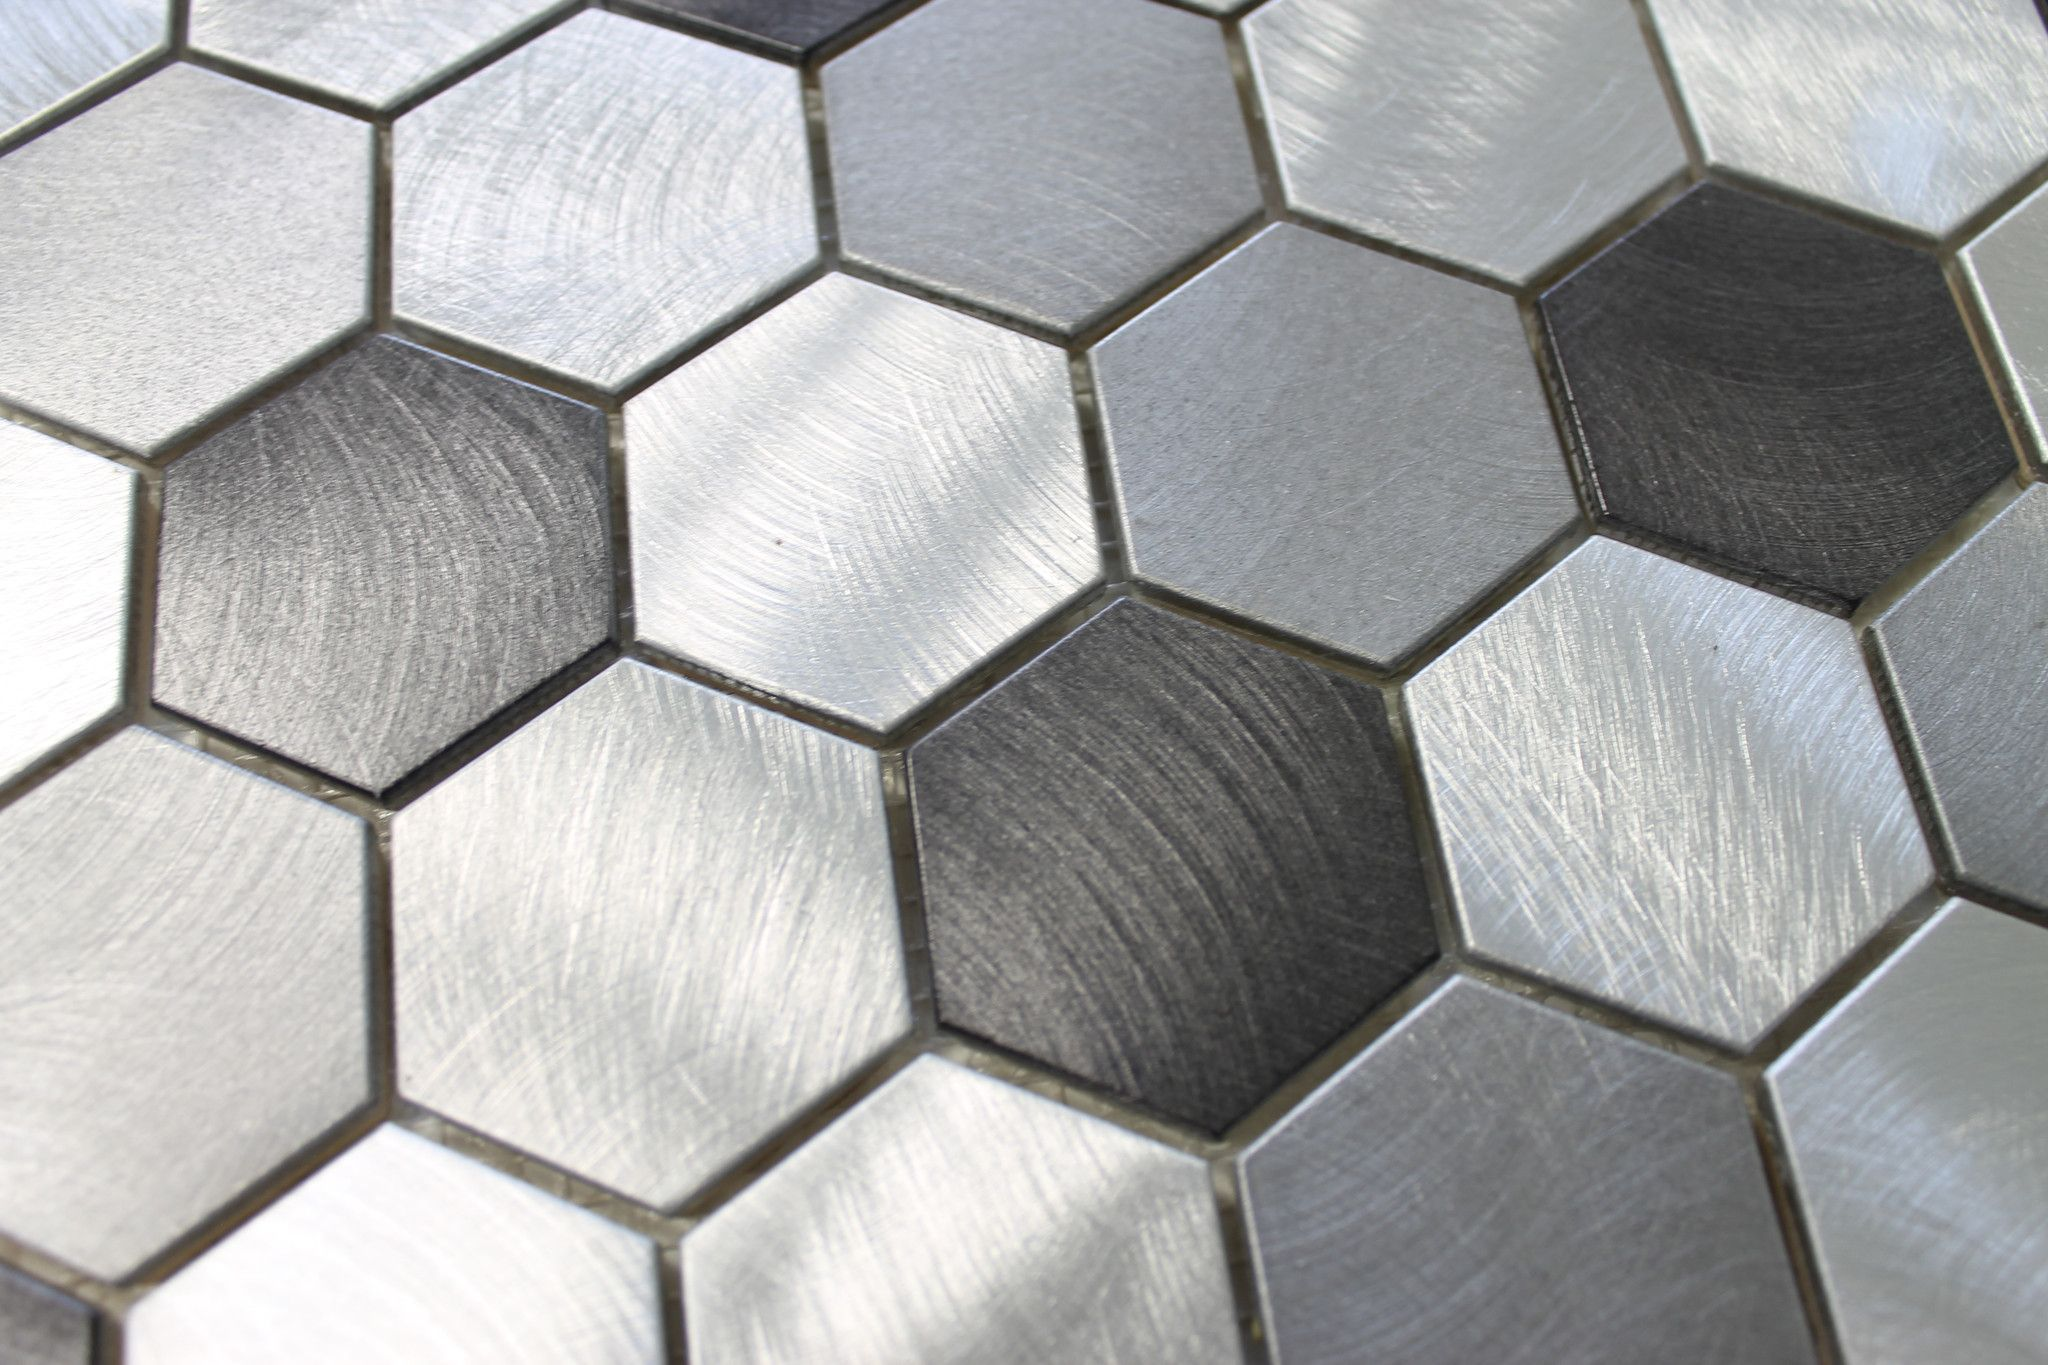 Uptown Brushed Aluminum 2 Inch Hexagon Mosaic Tiles Hexagonal Mosaic Hexagon Mosaic Tile Mosaic Tiles